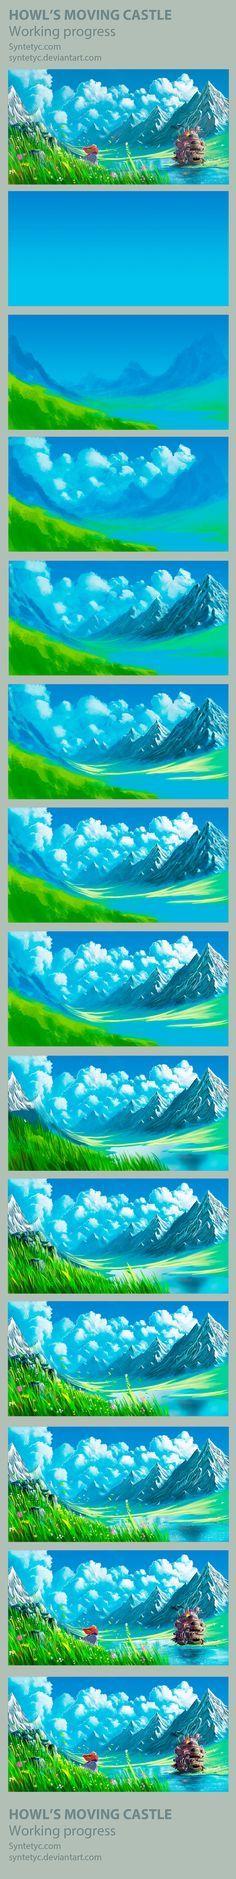 Howls Moving Castle - Process by Syntetyc.deviantart.com on @deviantART